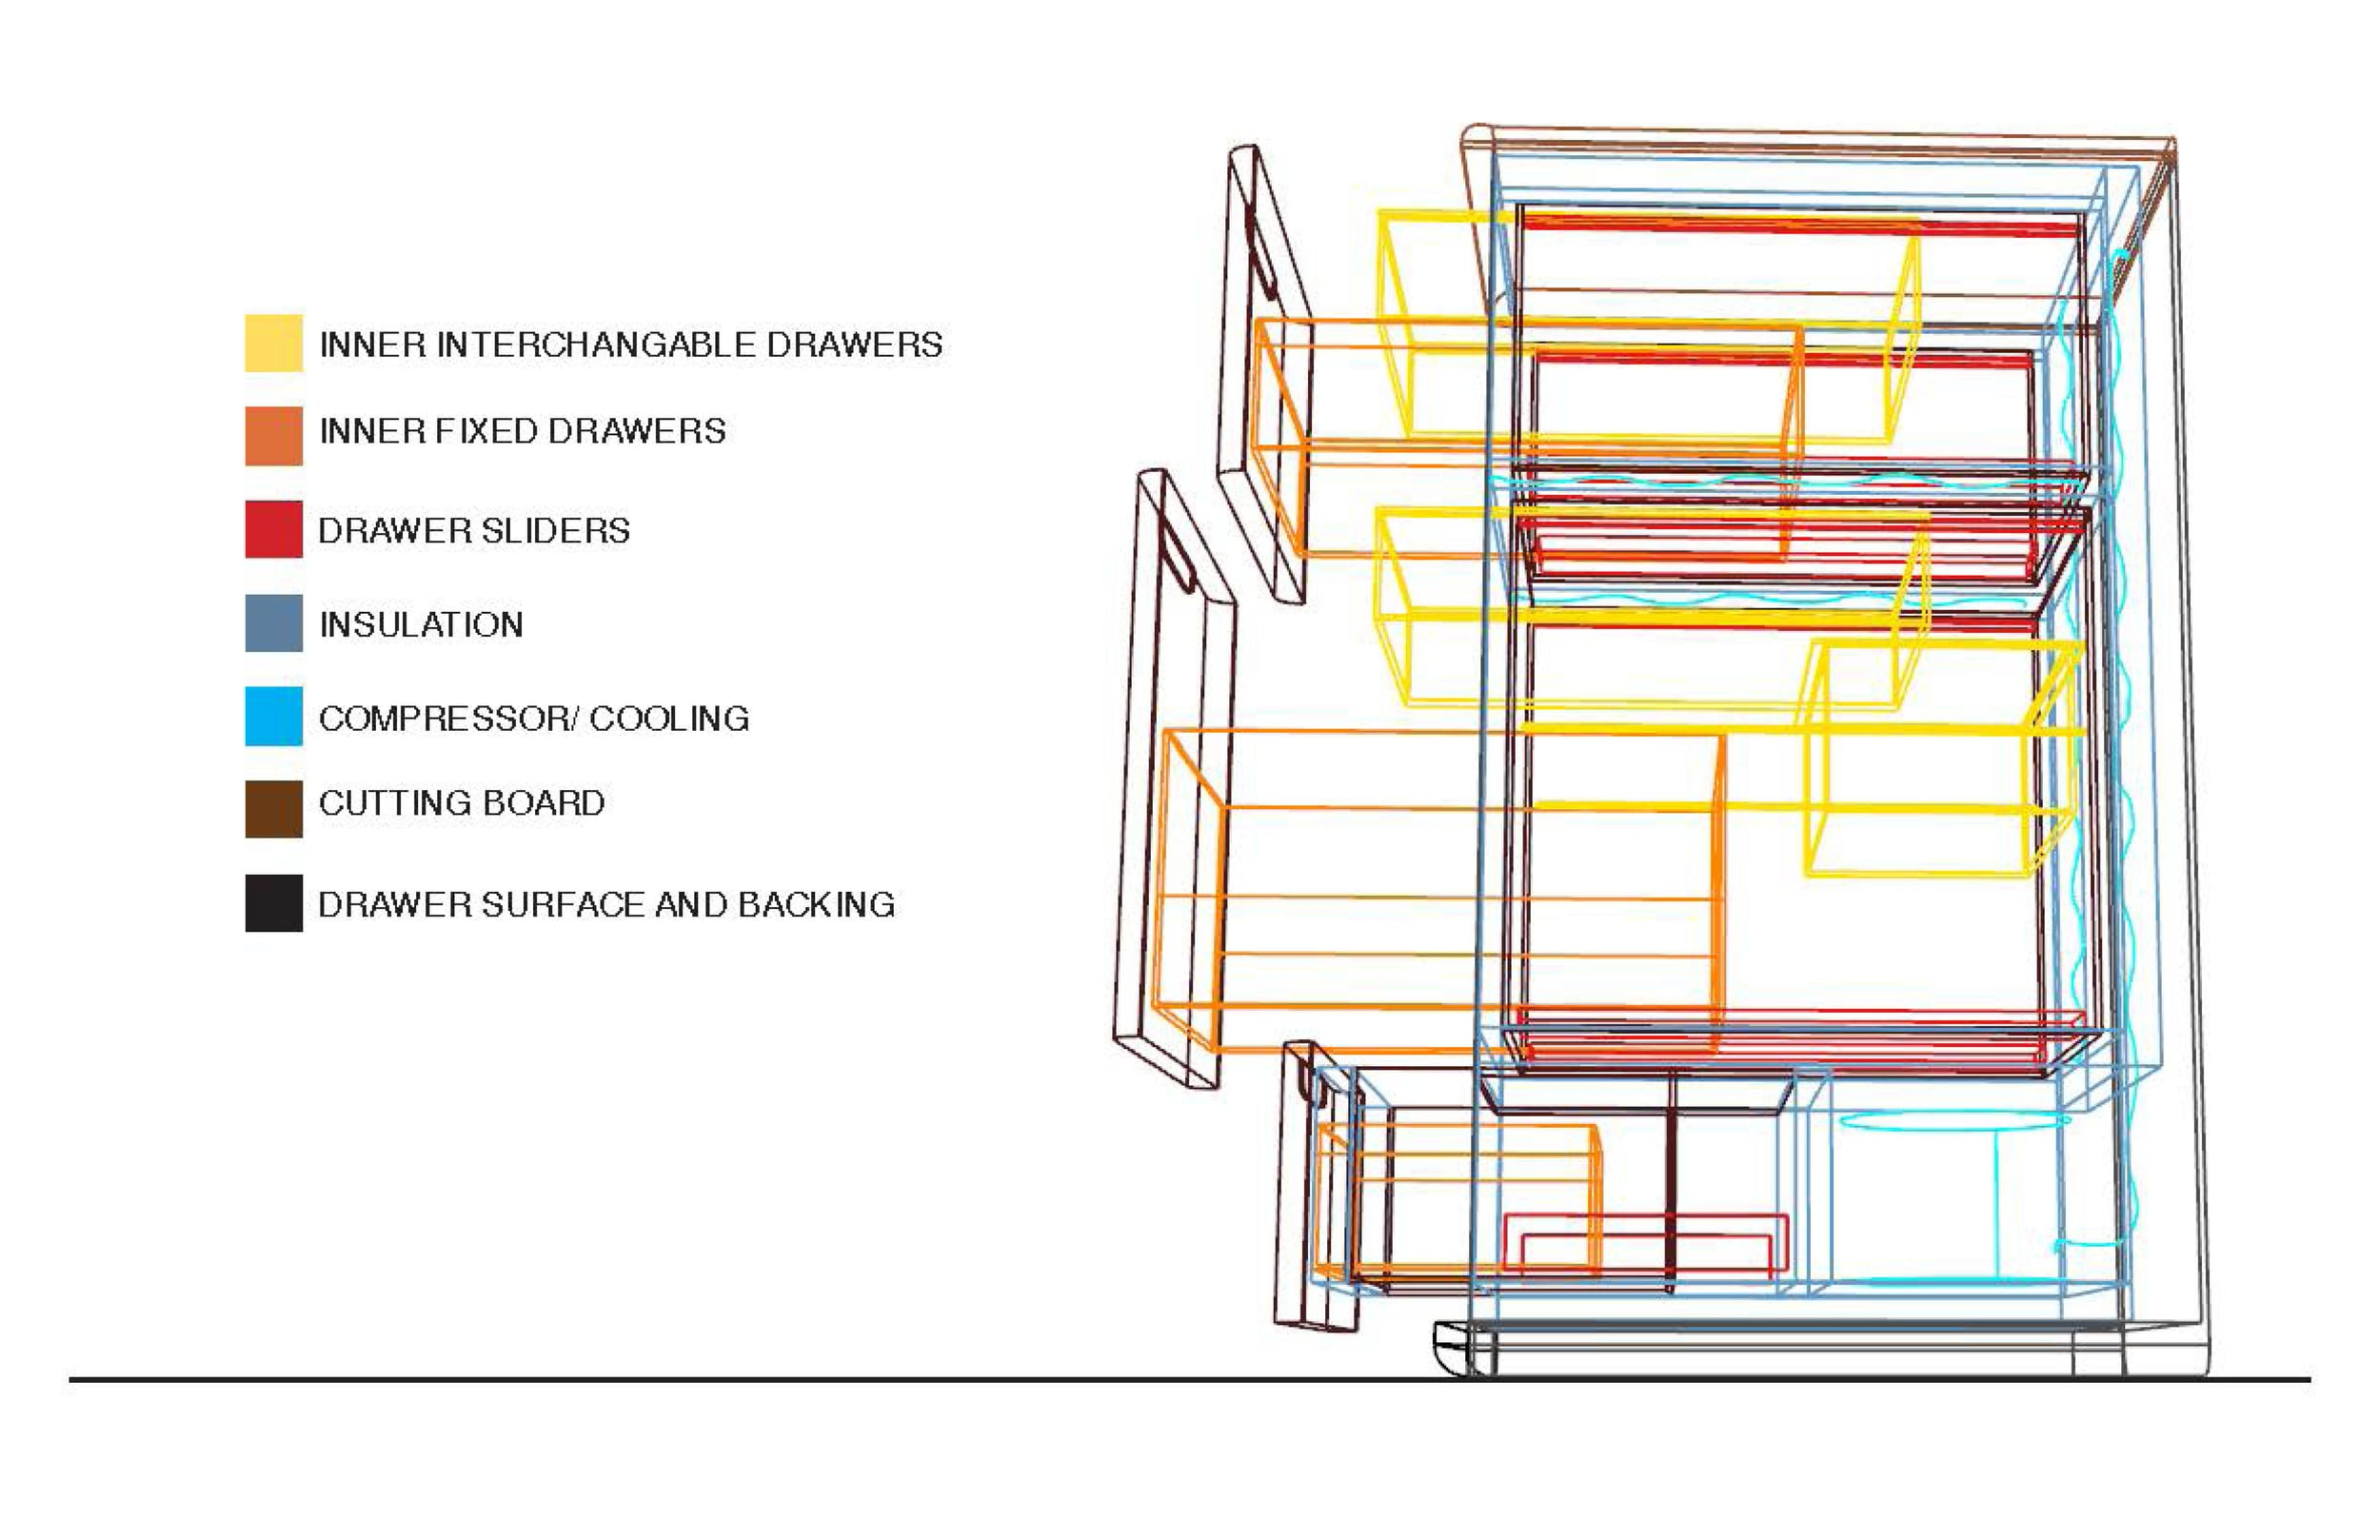 19-SLATE Compact Fridge-Color Function.jpg